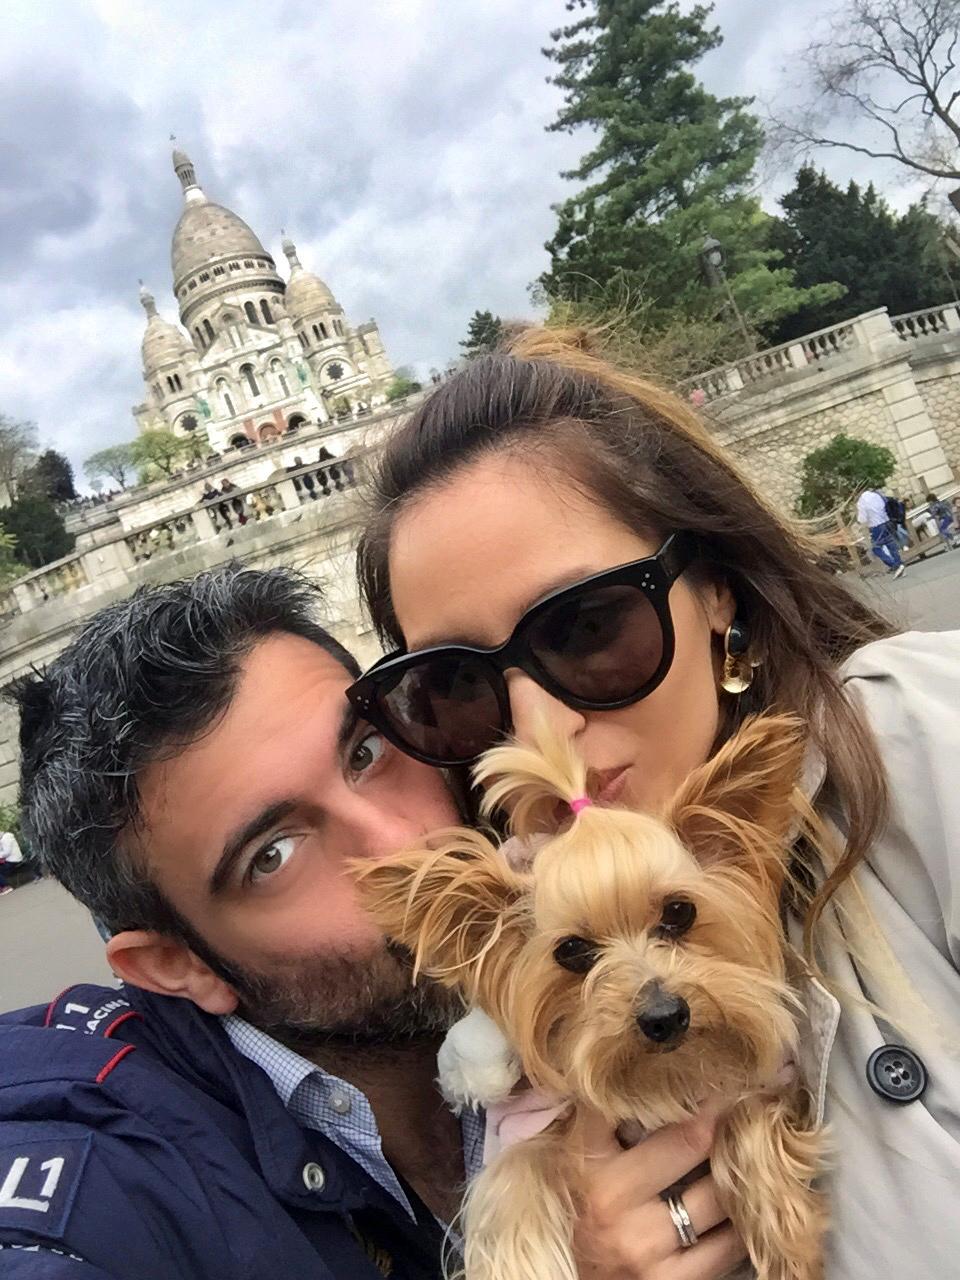 Viajar a Paris con Perro - Travel to Paris with dog viajar a paris con perro Viajar a Paris con perro 34471060621 98403d342c o